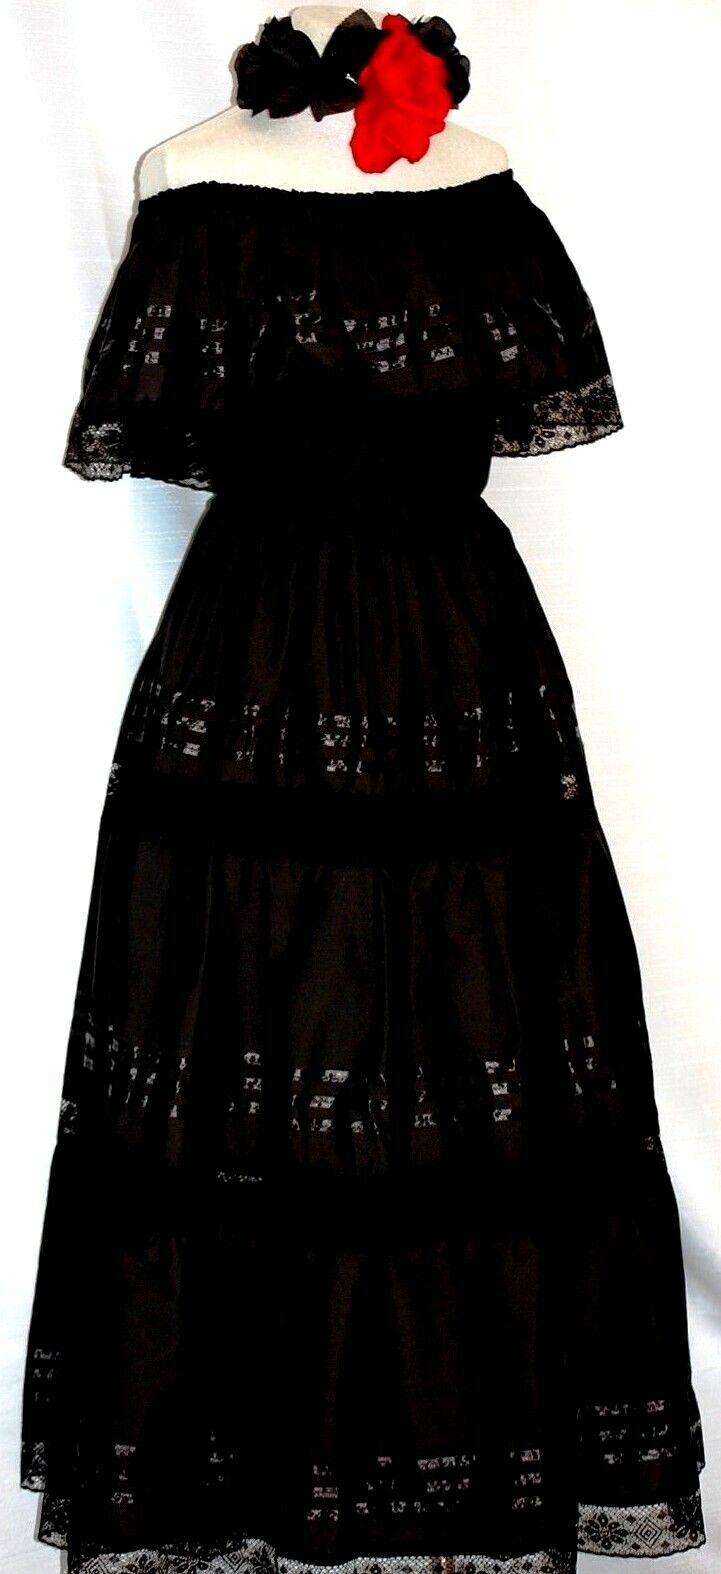 5 de Mayo Mexican schwarz Maxi Dress Off shoulder Catrina Day of the Dead Ruffle